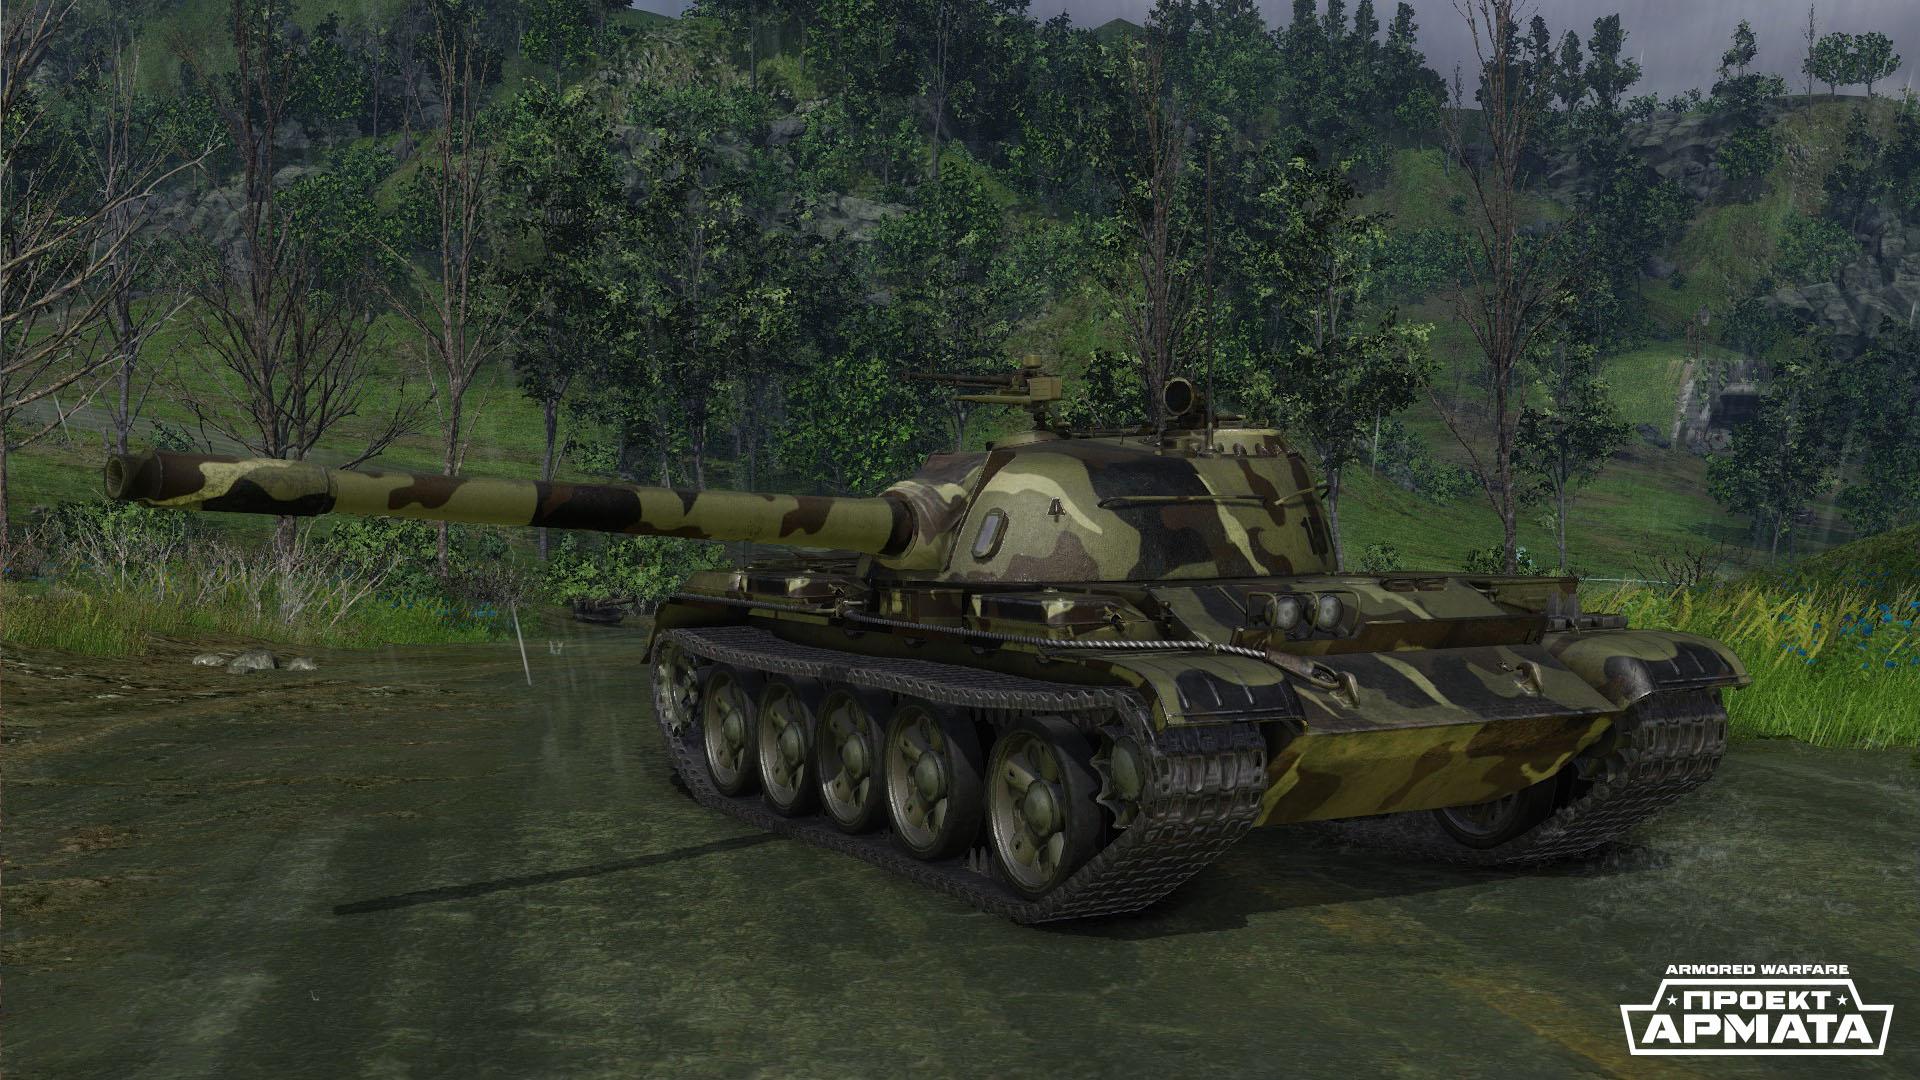 armored warfare type 59 бонус код